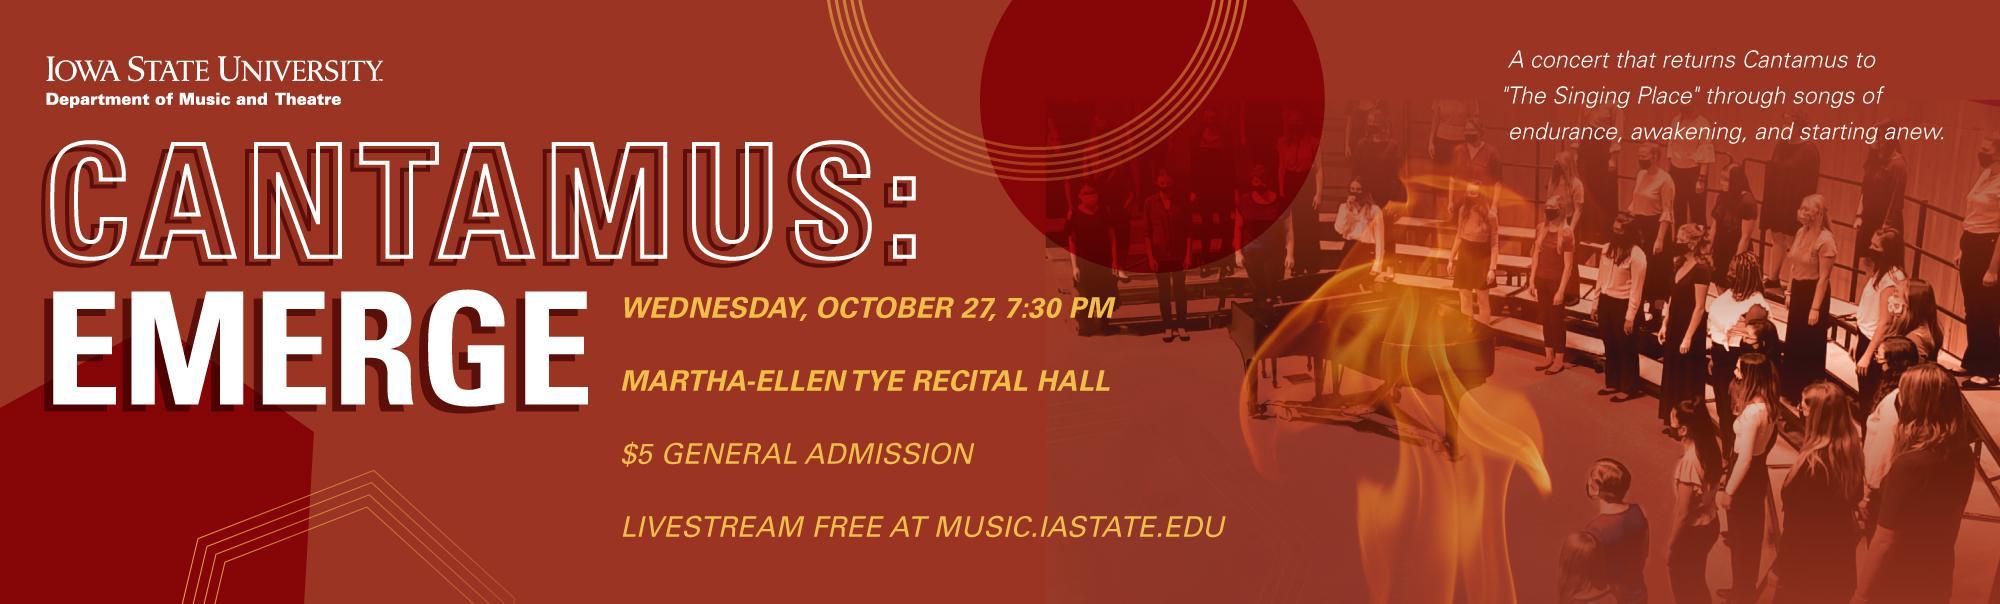 ISU Department of Music and Theatre presents Cantamus: Emerge